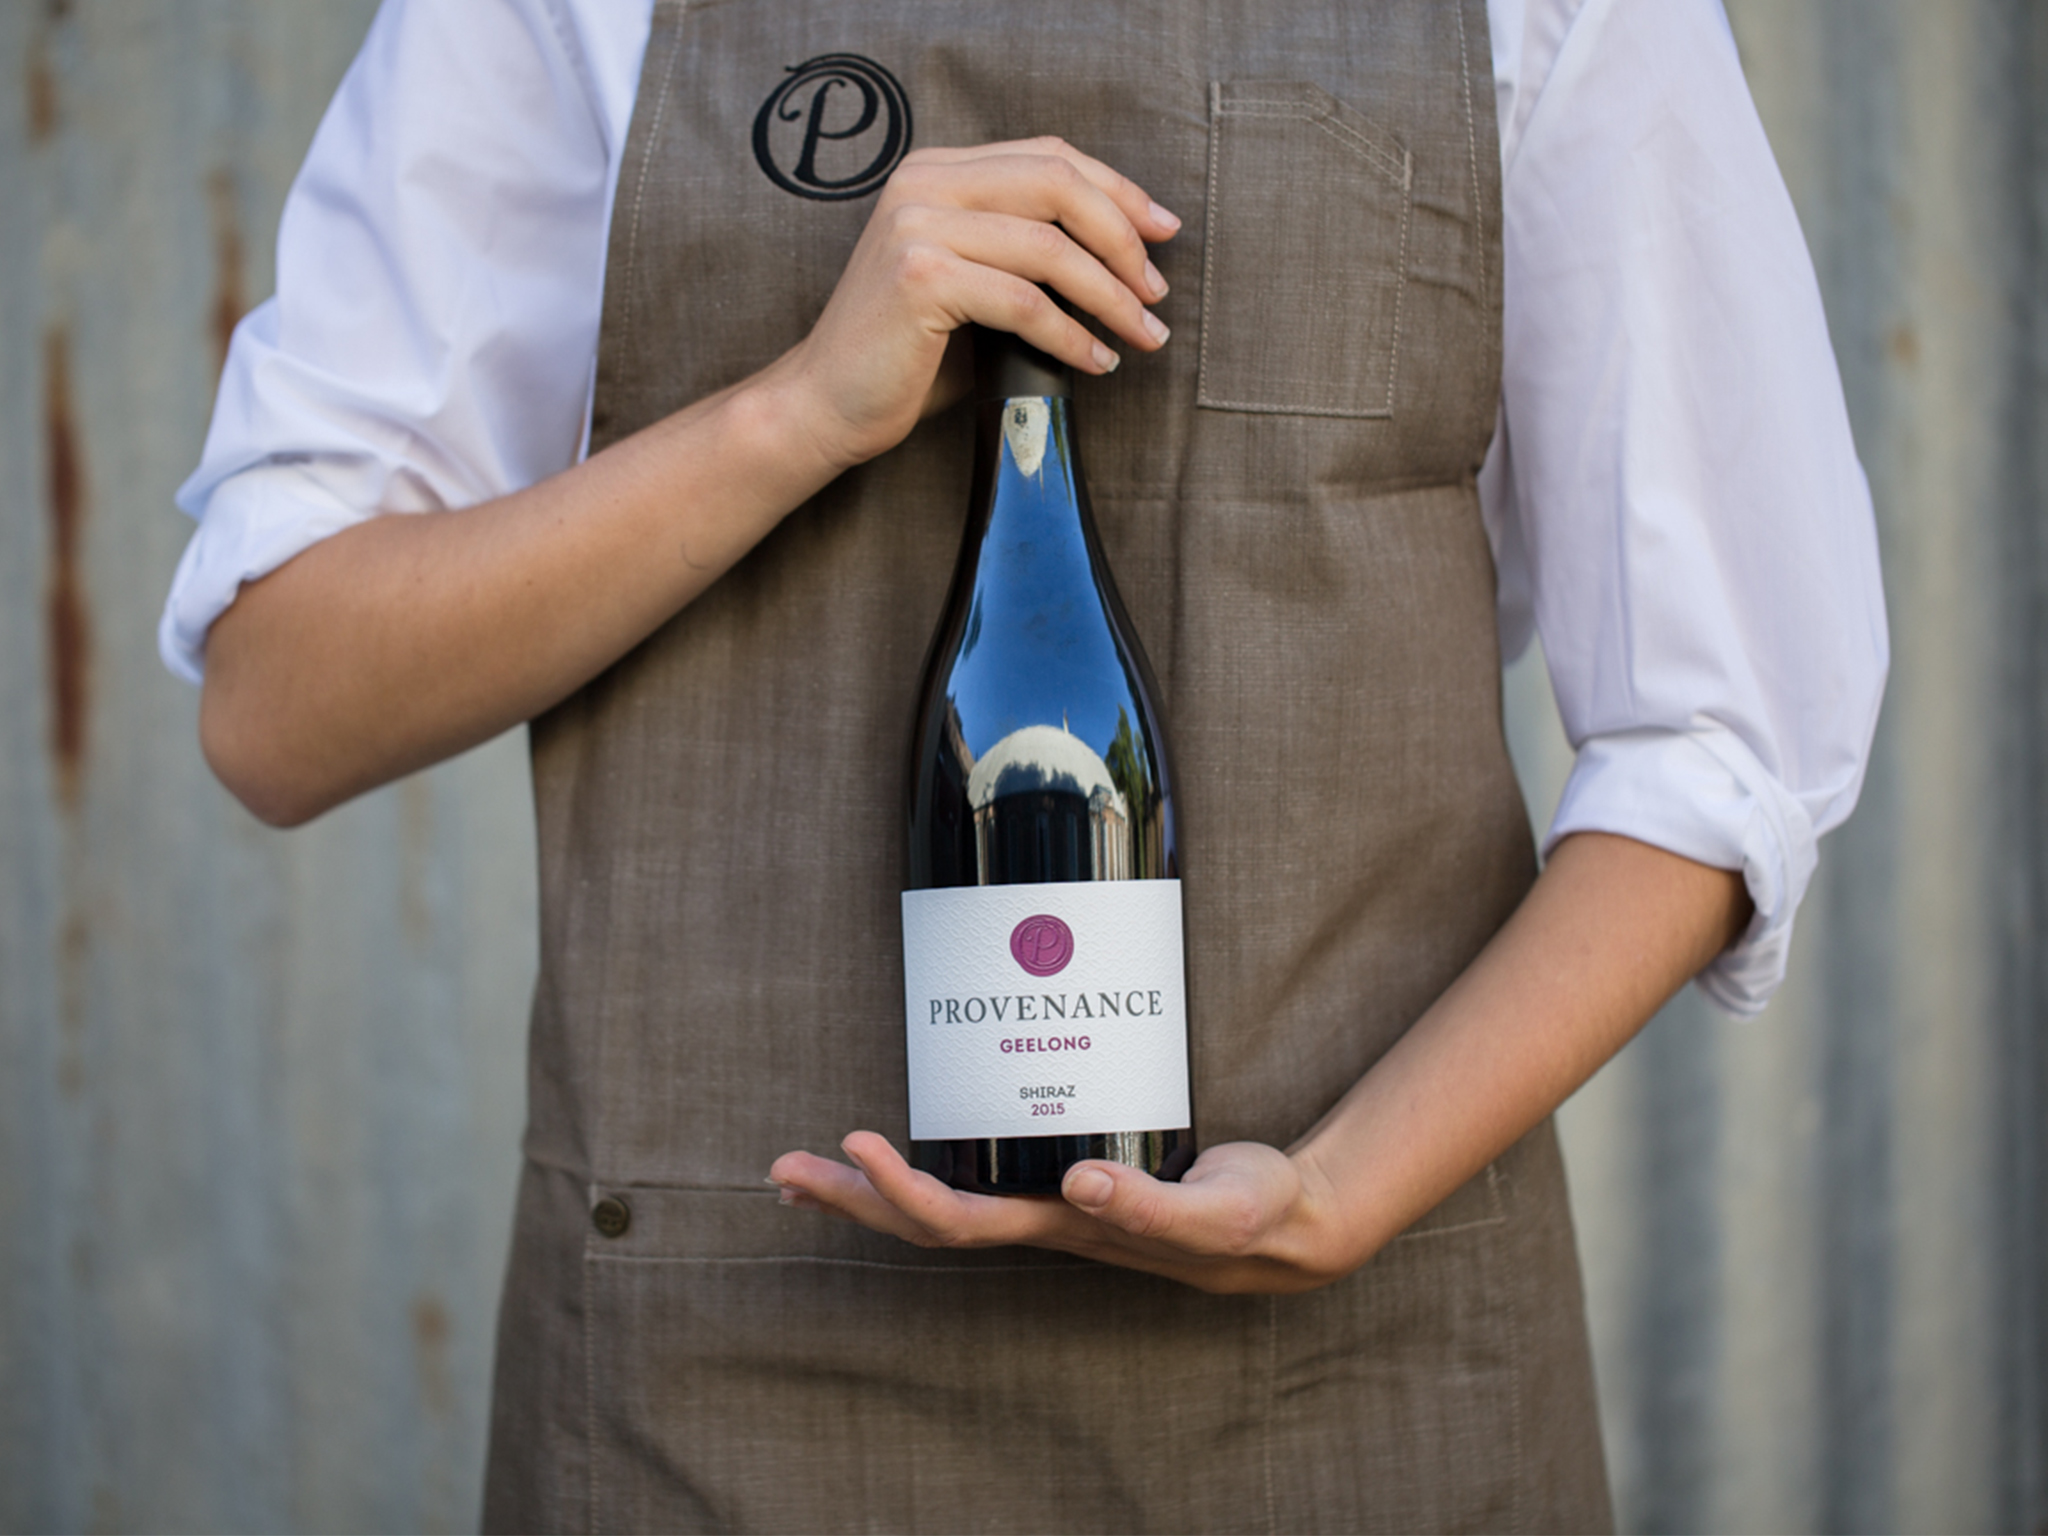 Provenance Wines - Geelong Shiraz 2015